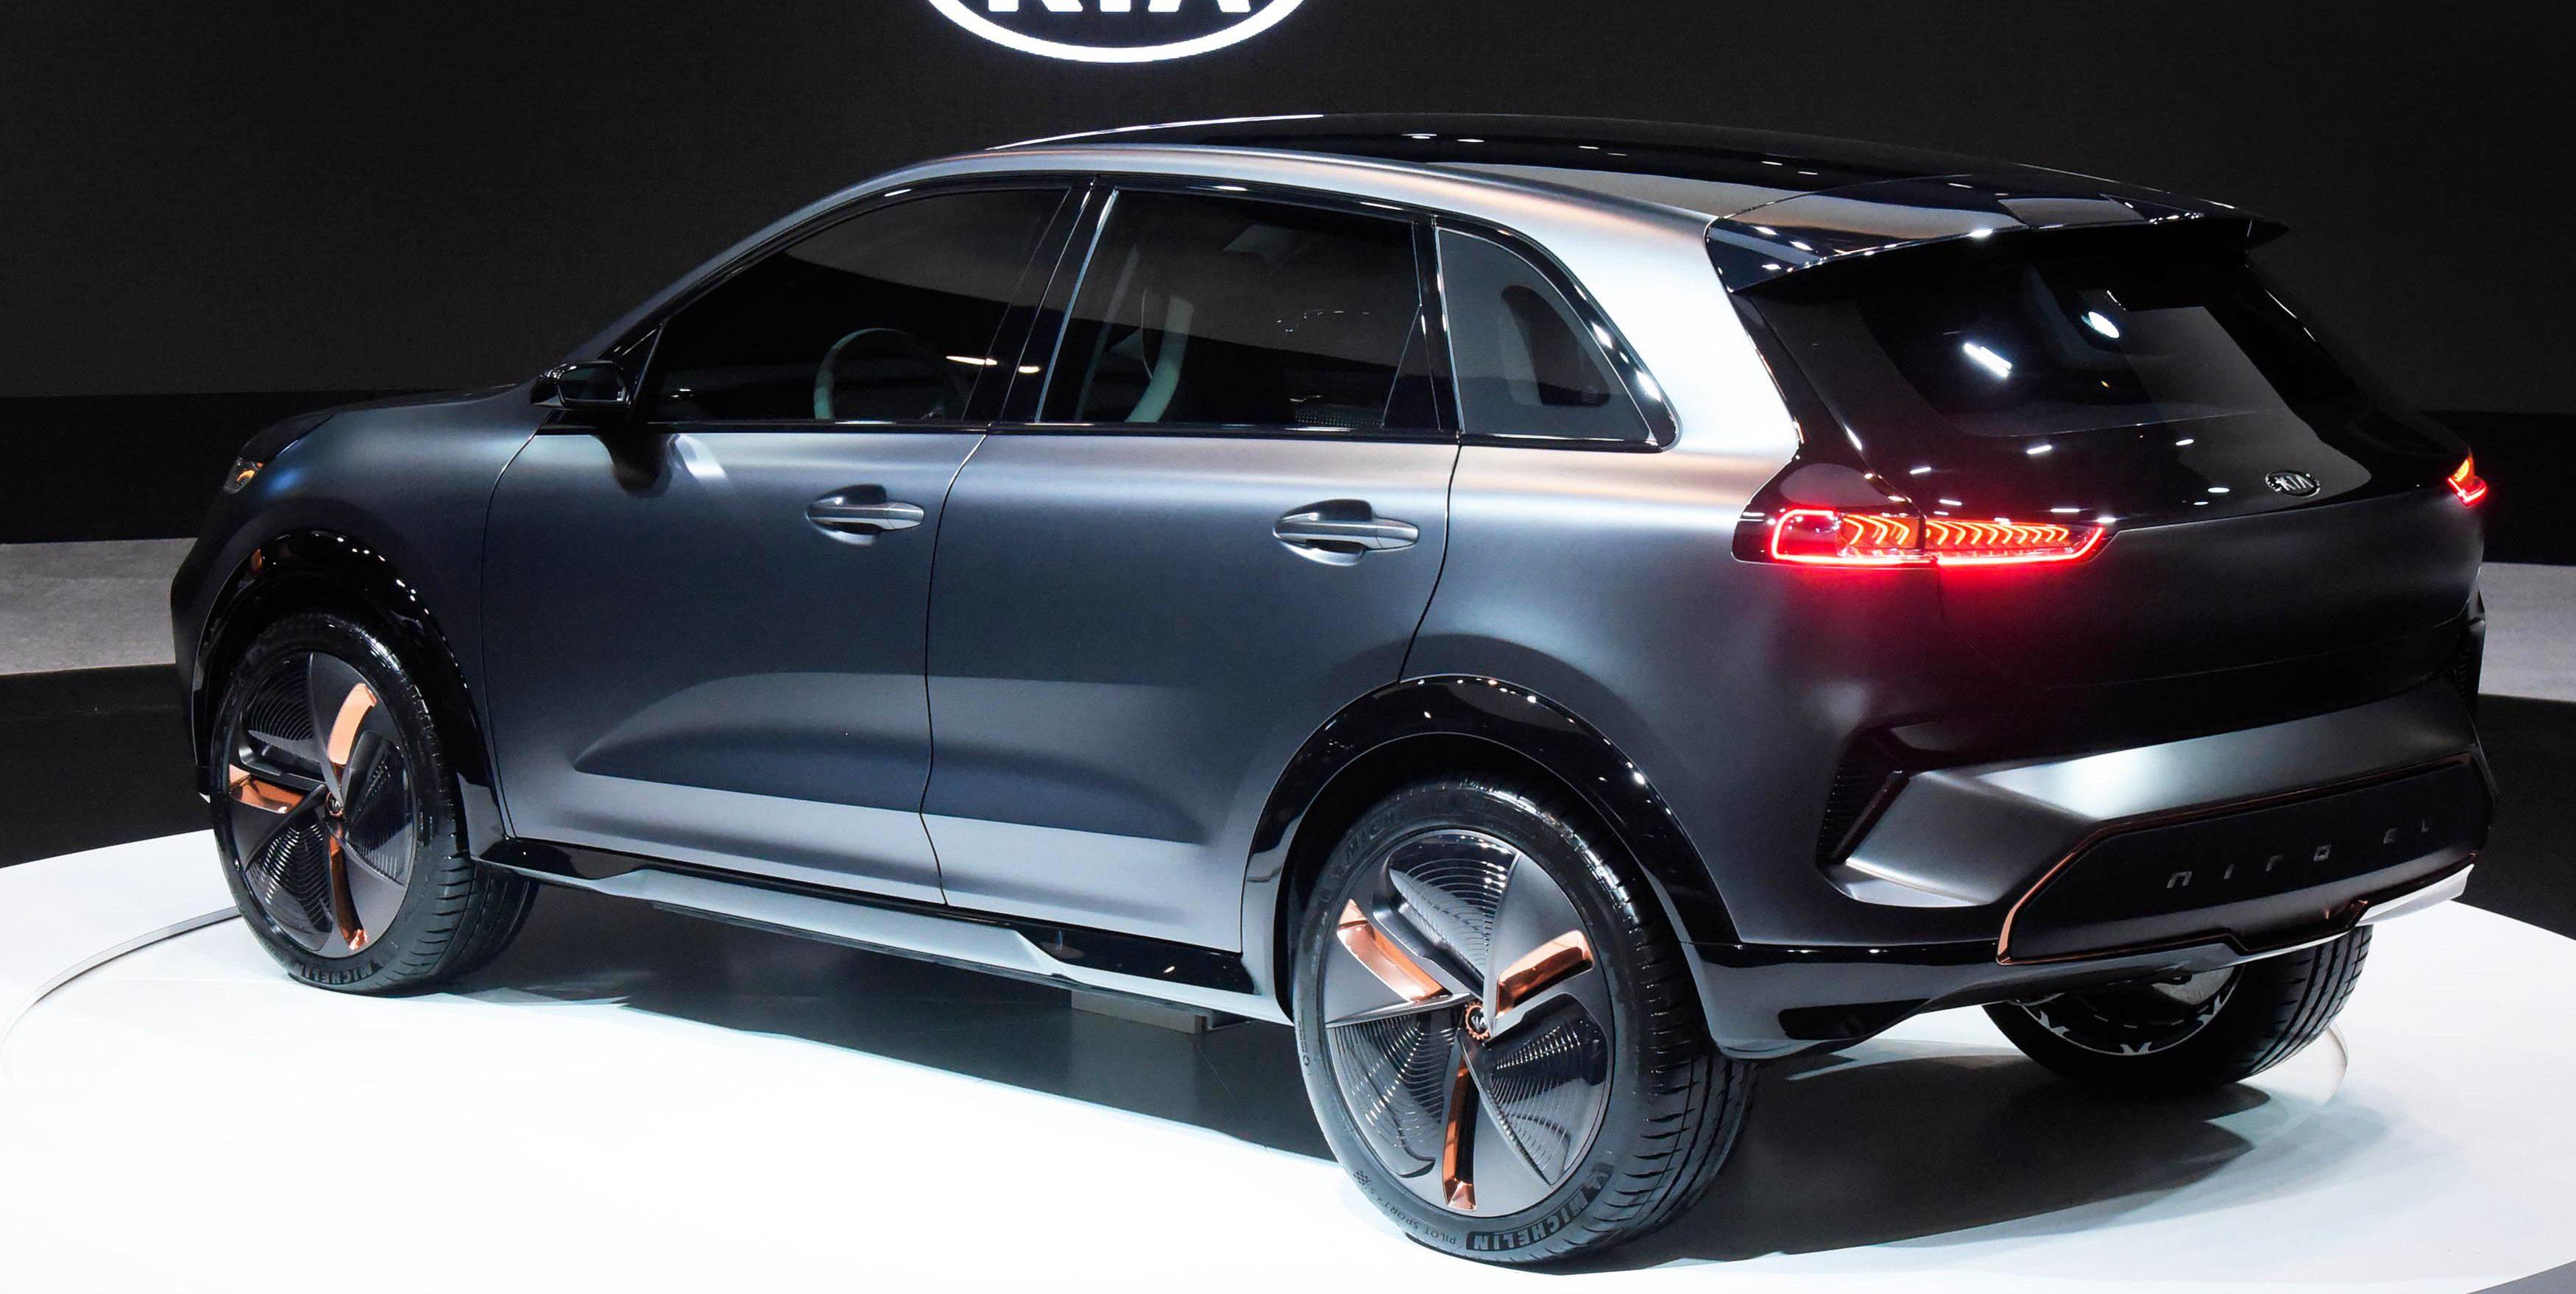 2018 Kia Soul >> Kia unveils new all-electric compact SUV concept ahead of Niro EV launch - Electrek